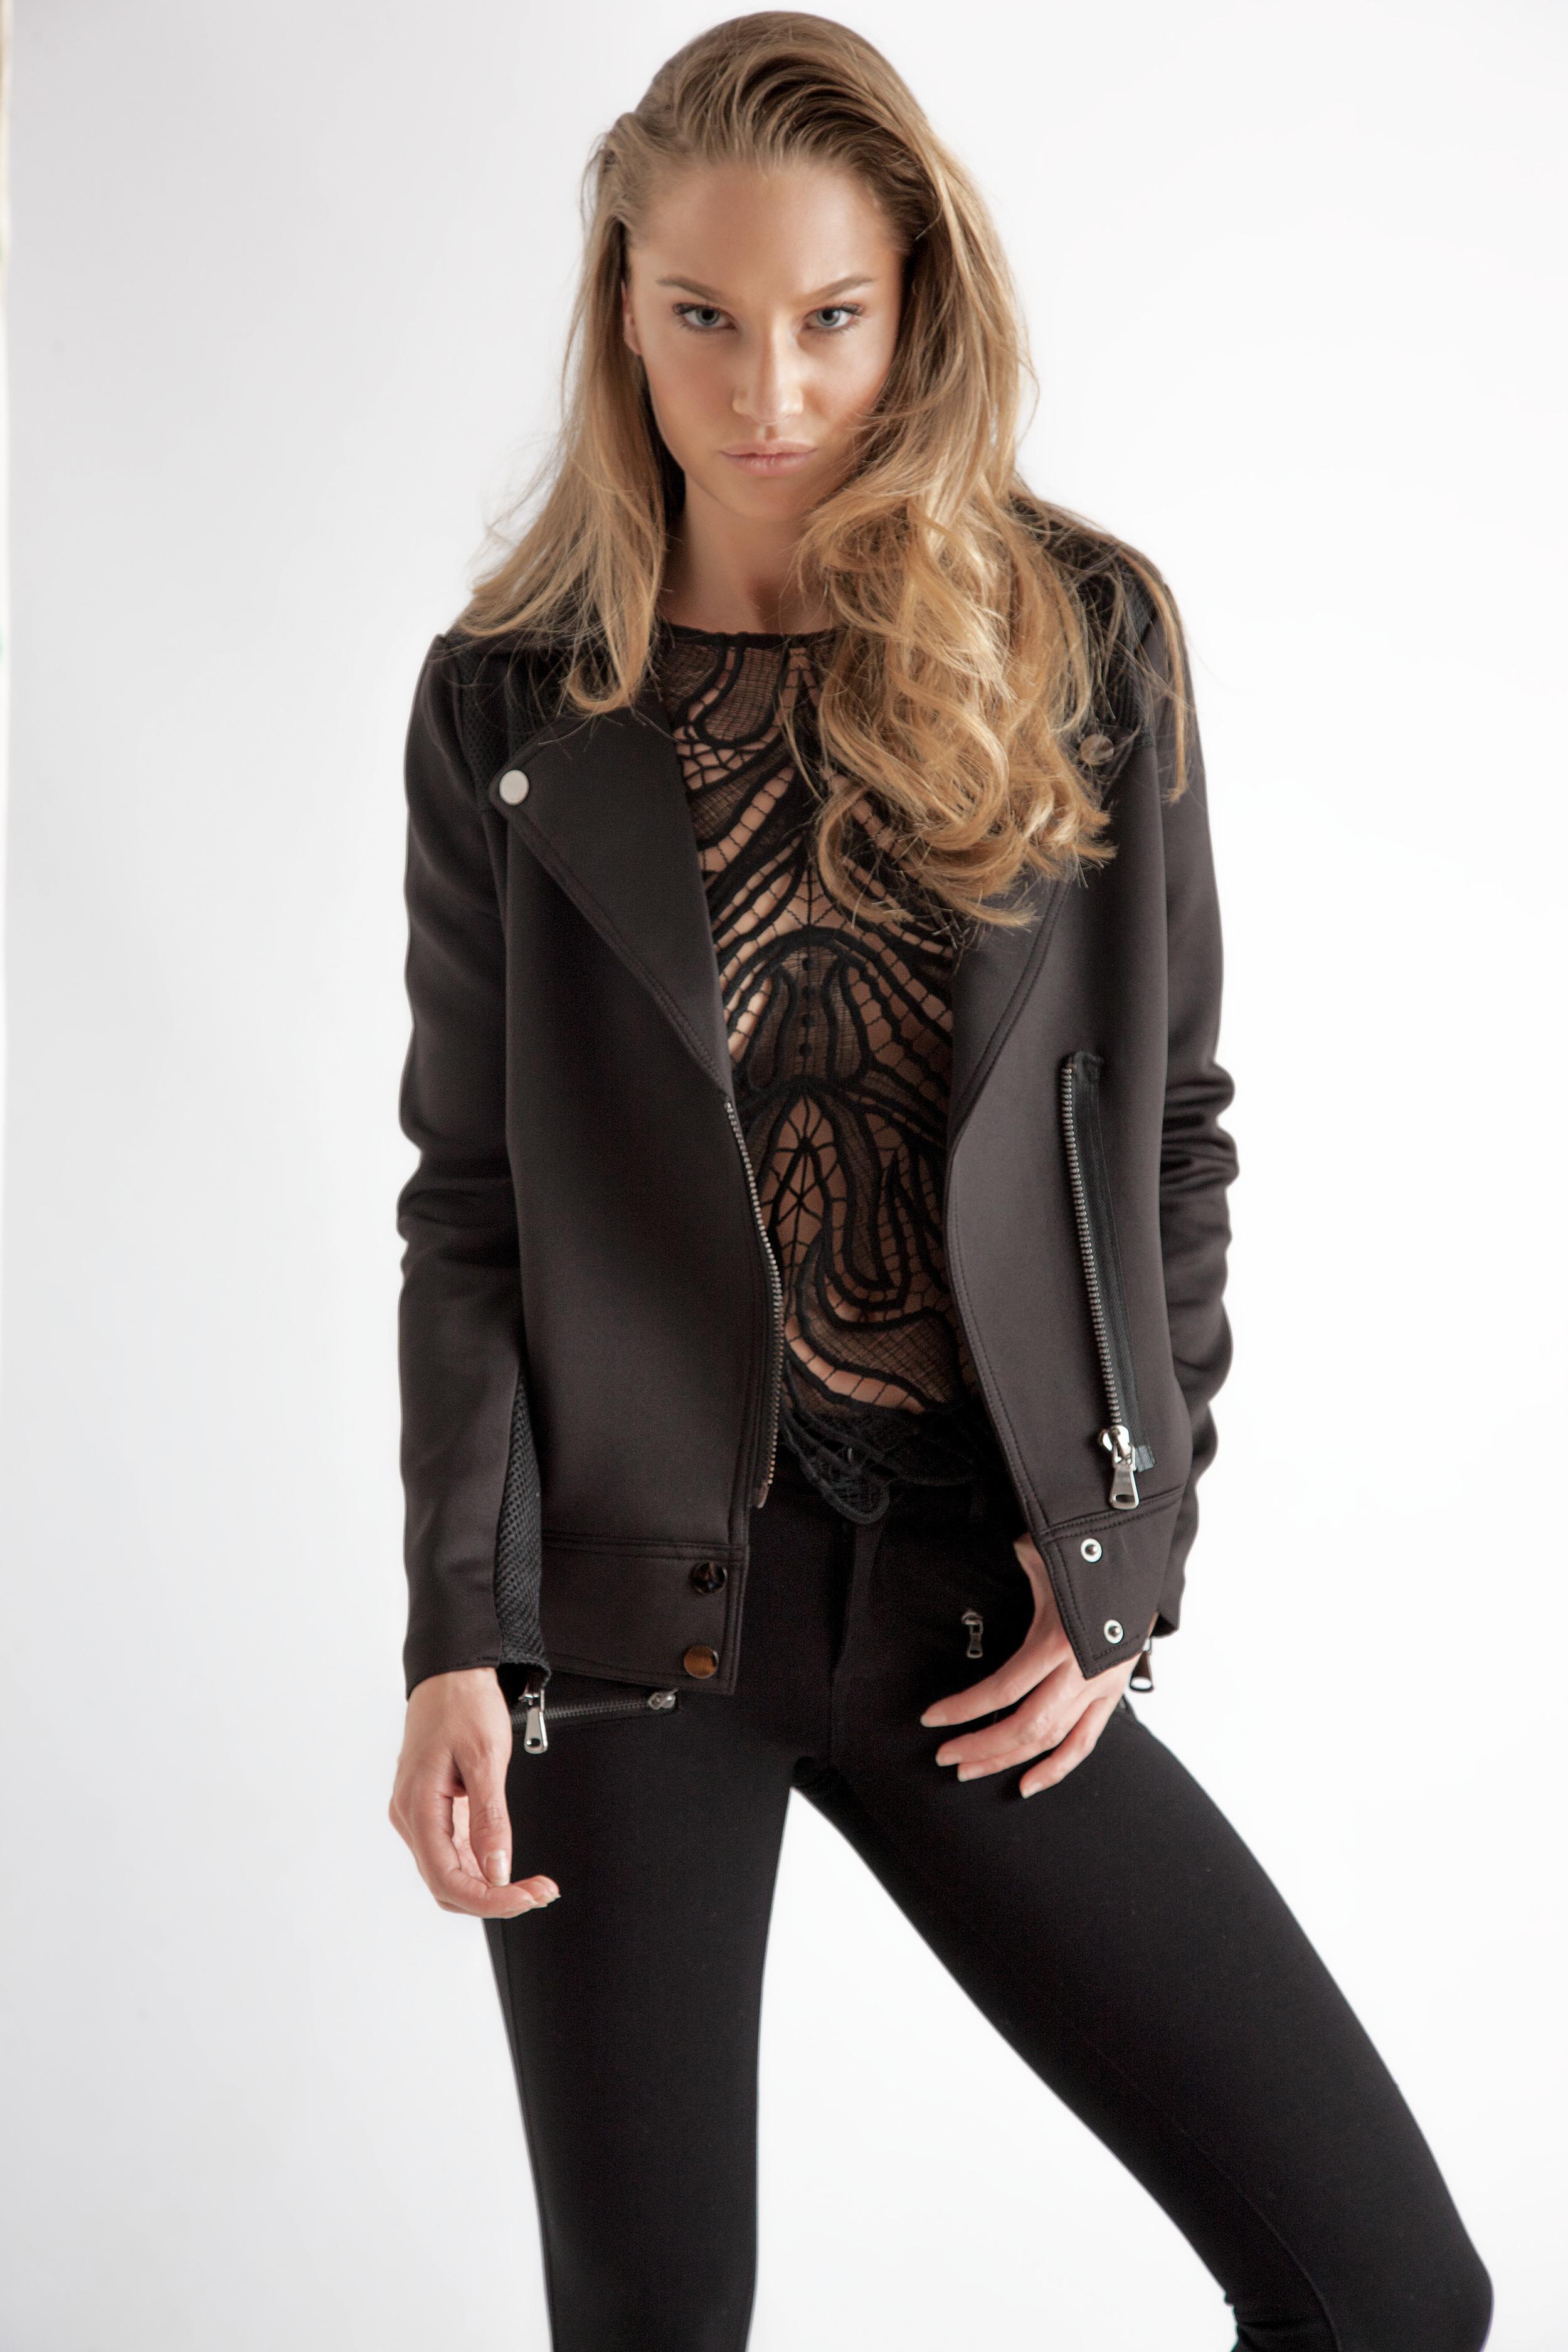 Lace Top by Generation Love $245 | Moto Jacket by John & Jenn $149 | Ponte Pant by Paige $299